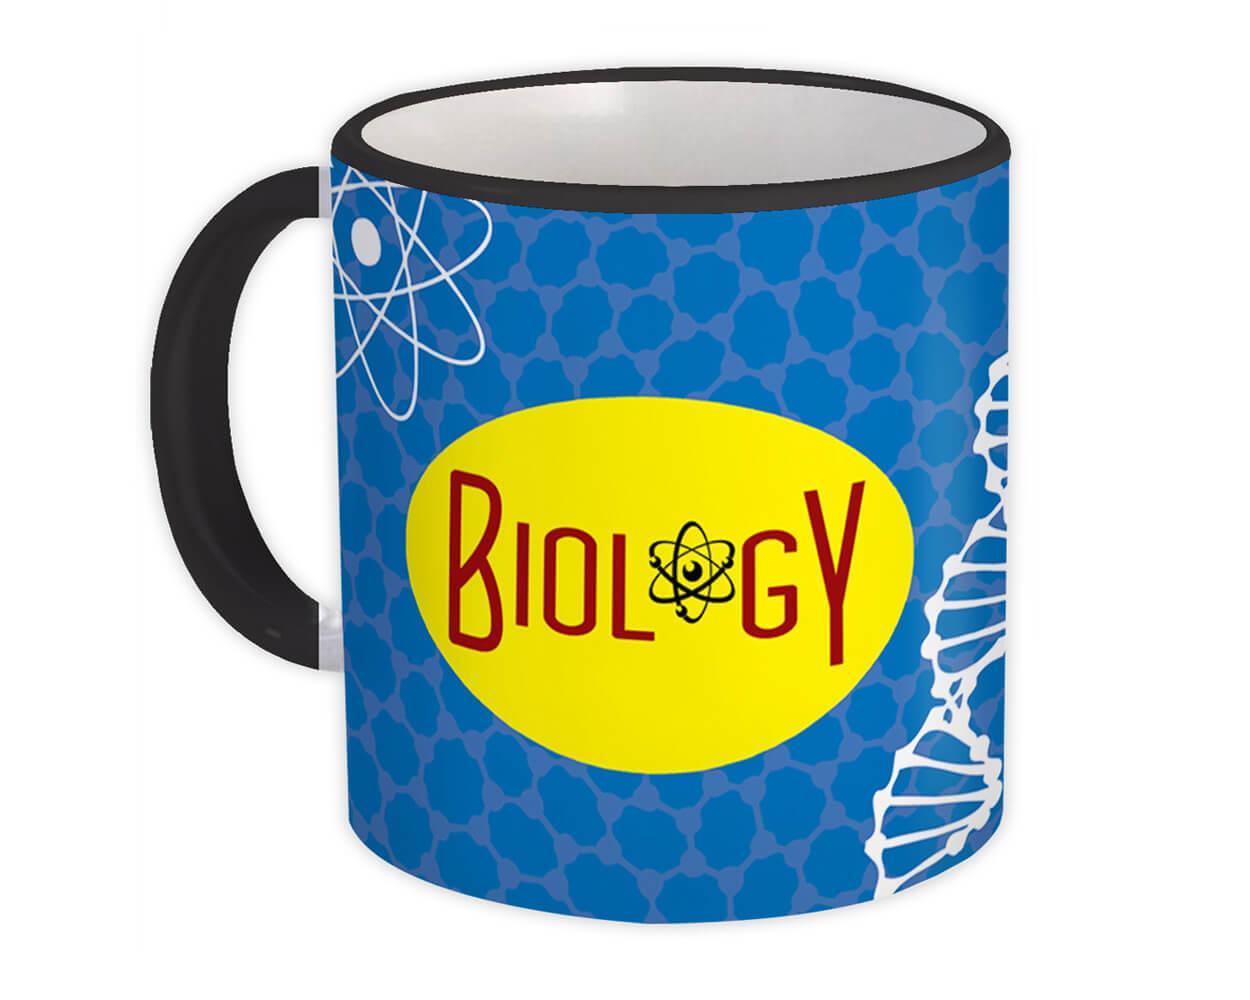 Biology : Gift Mug Profession Job Work Coworker Birthday Occupation Graduation